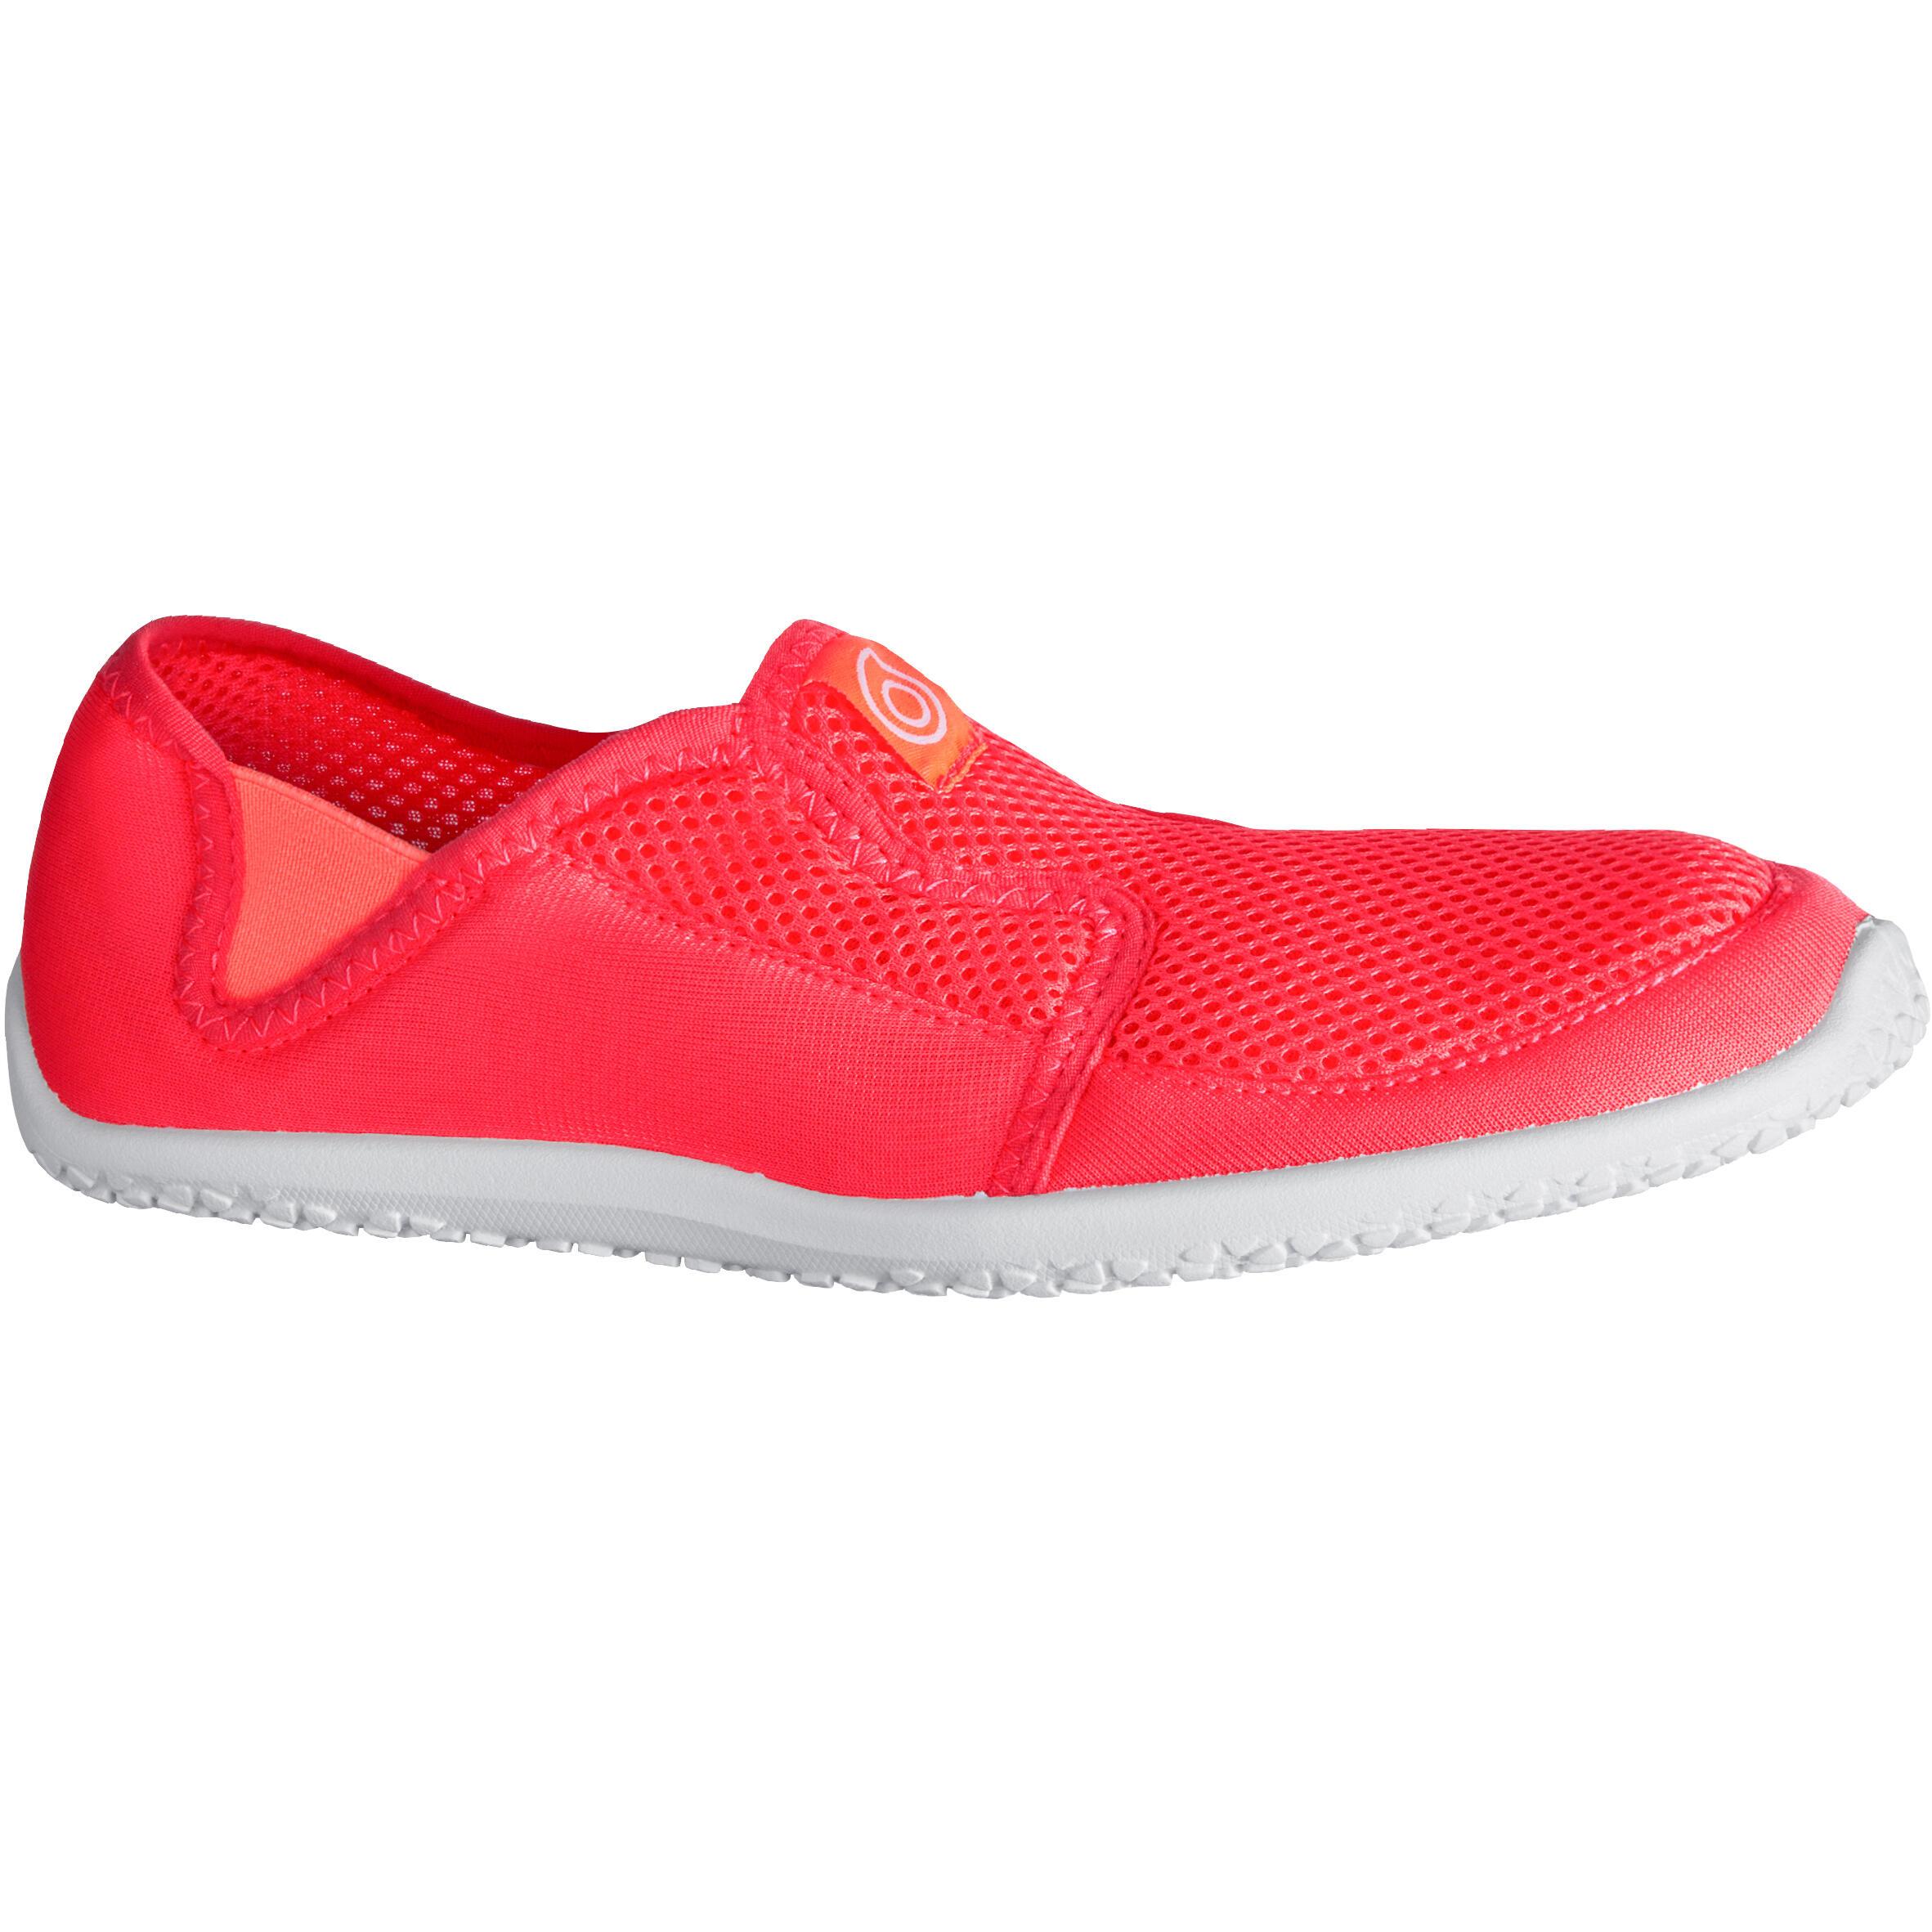 Aquaschuhe 120 Erwachsene   Schuhe > Badeschuhe   Subea